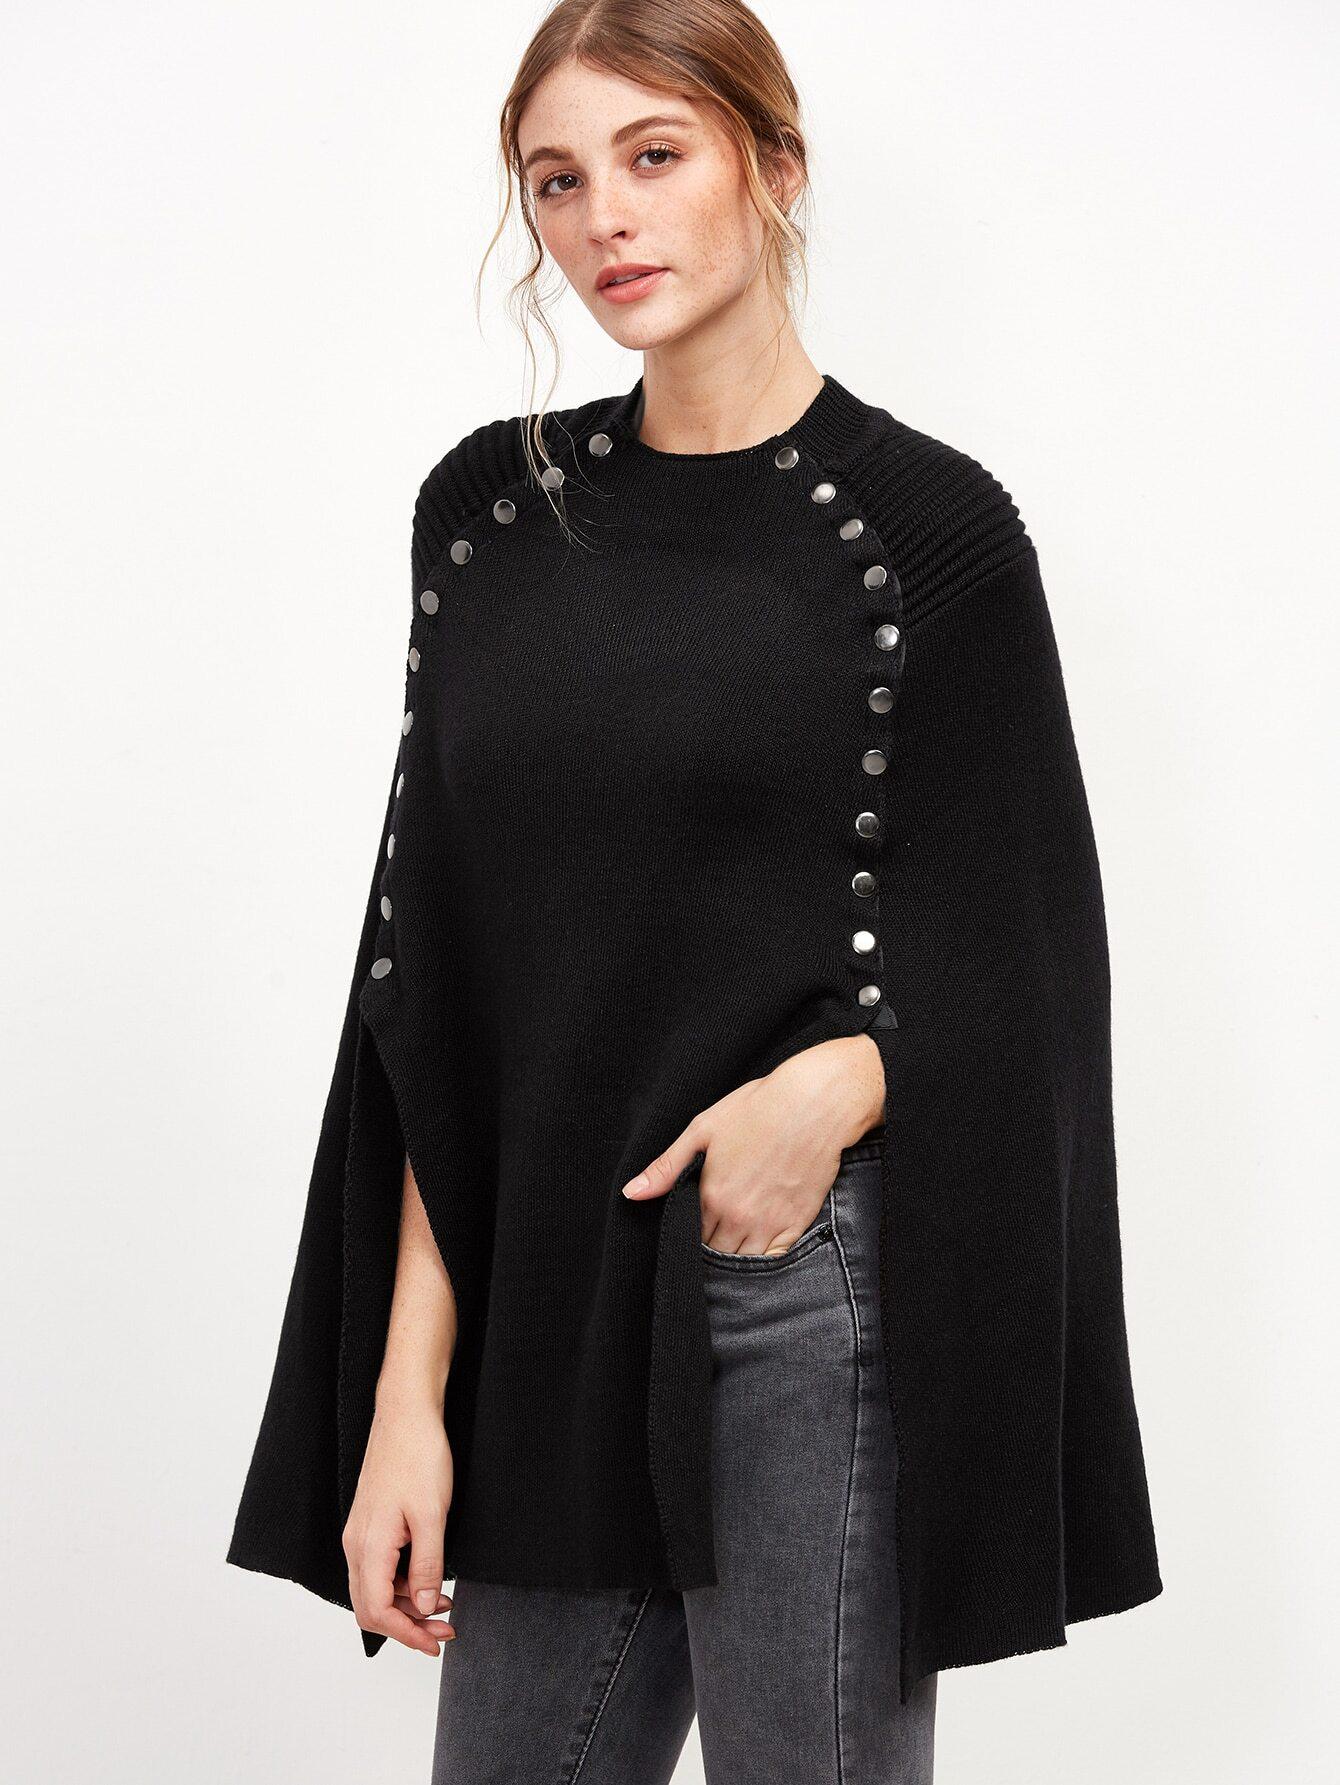 ac689c4c73bb Black Metal Button Embellished Poncho Sweater -SheIn(Sheinside)